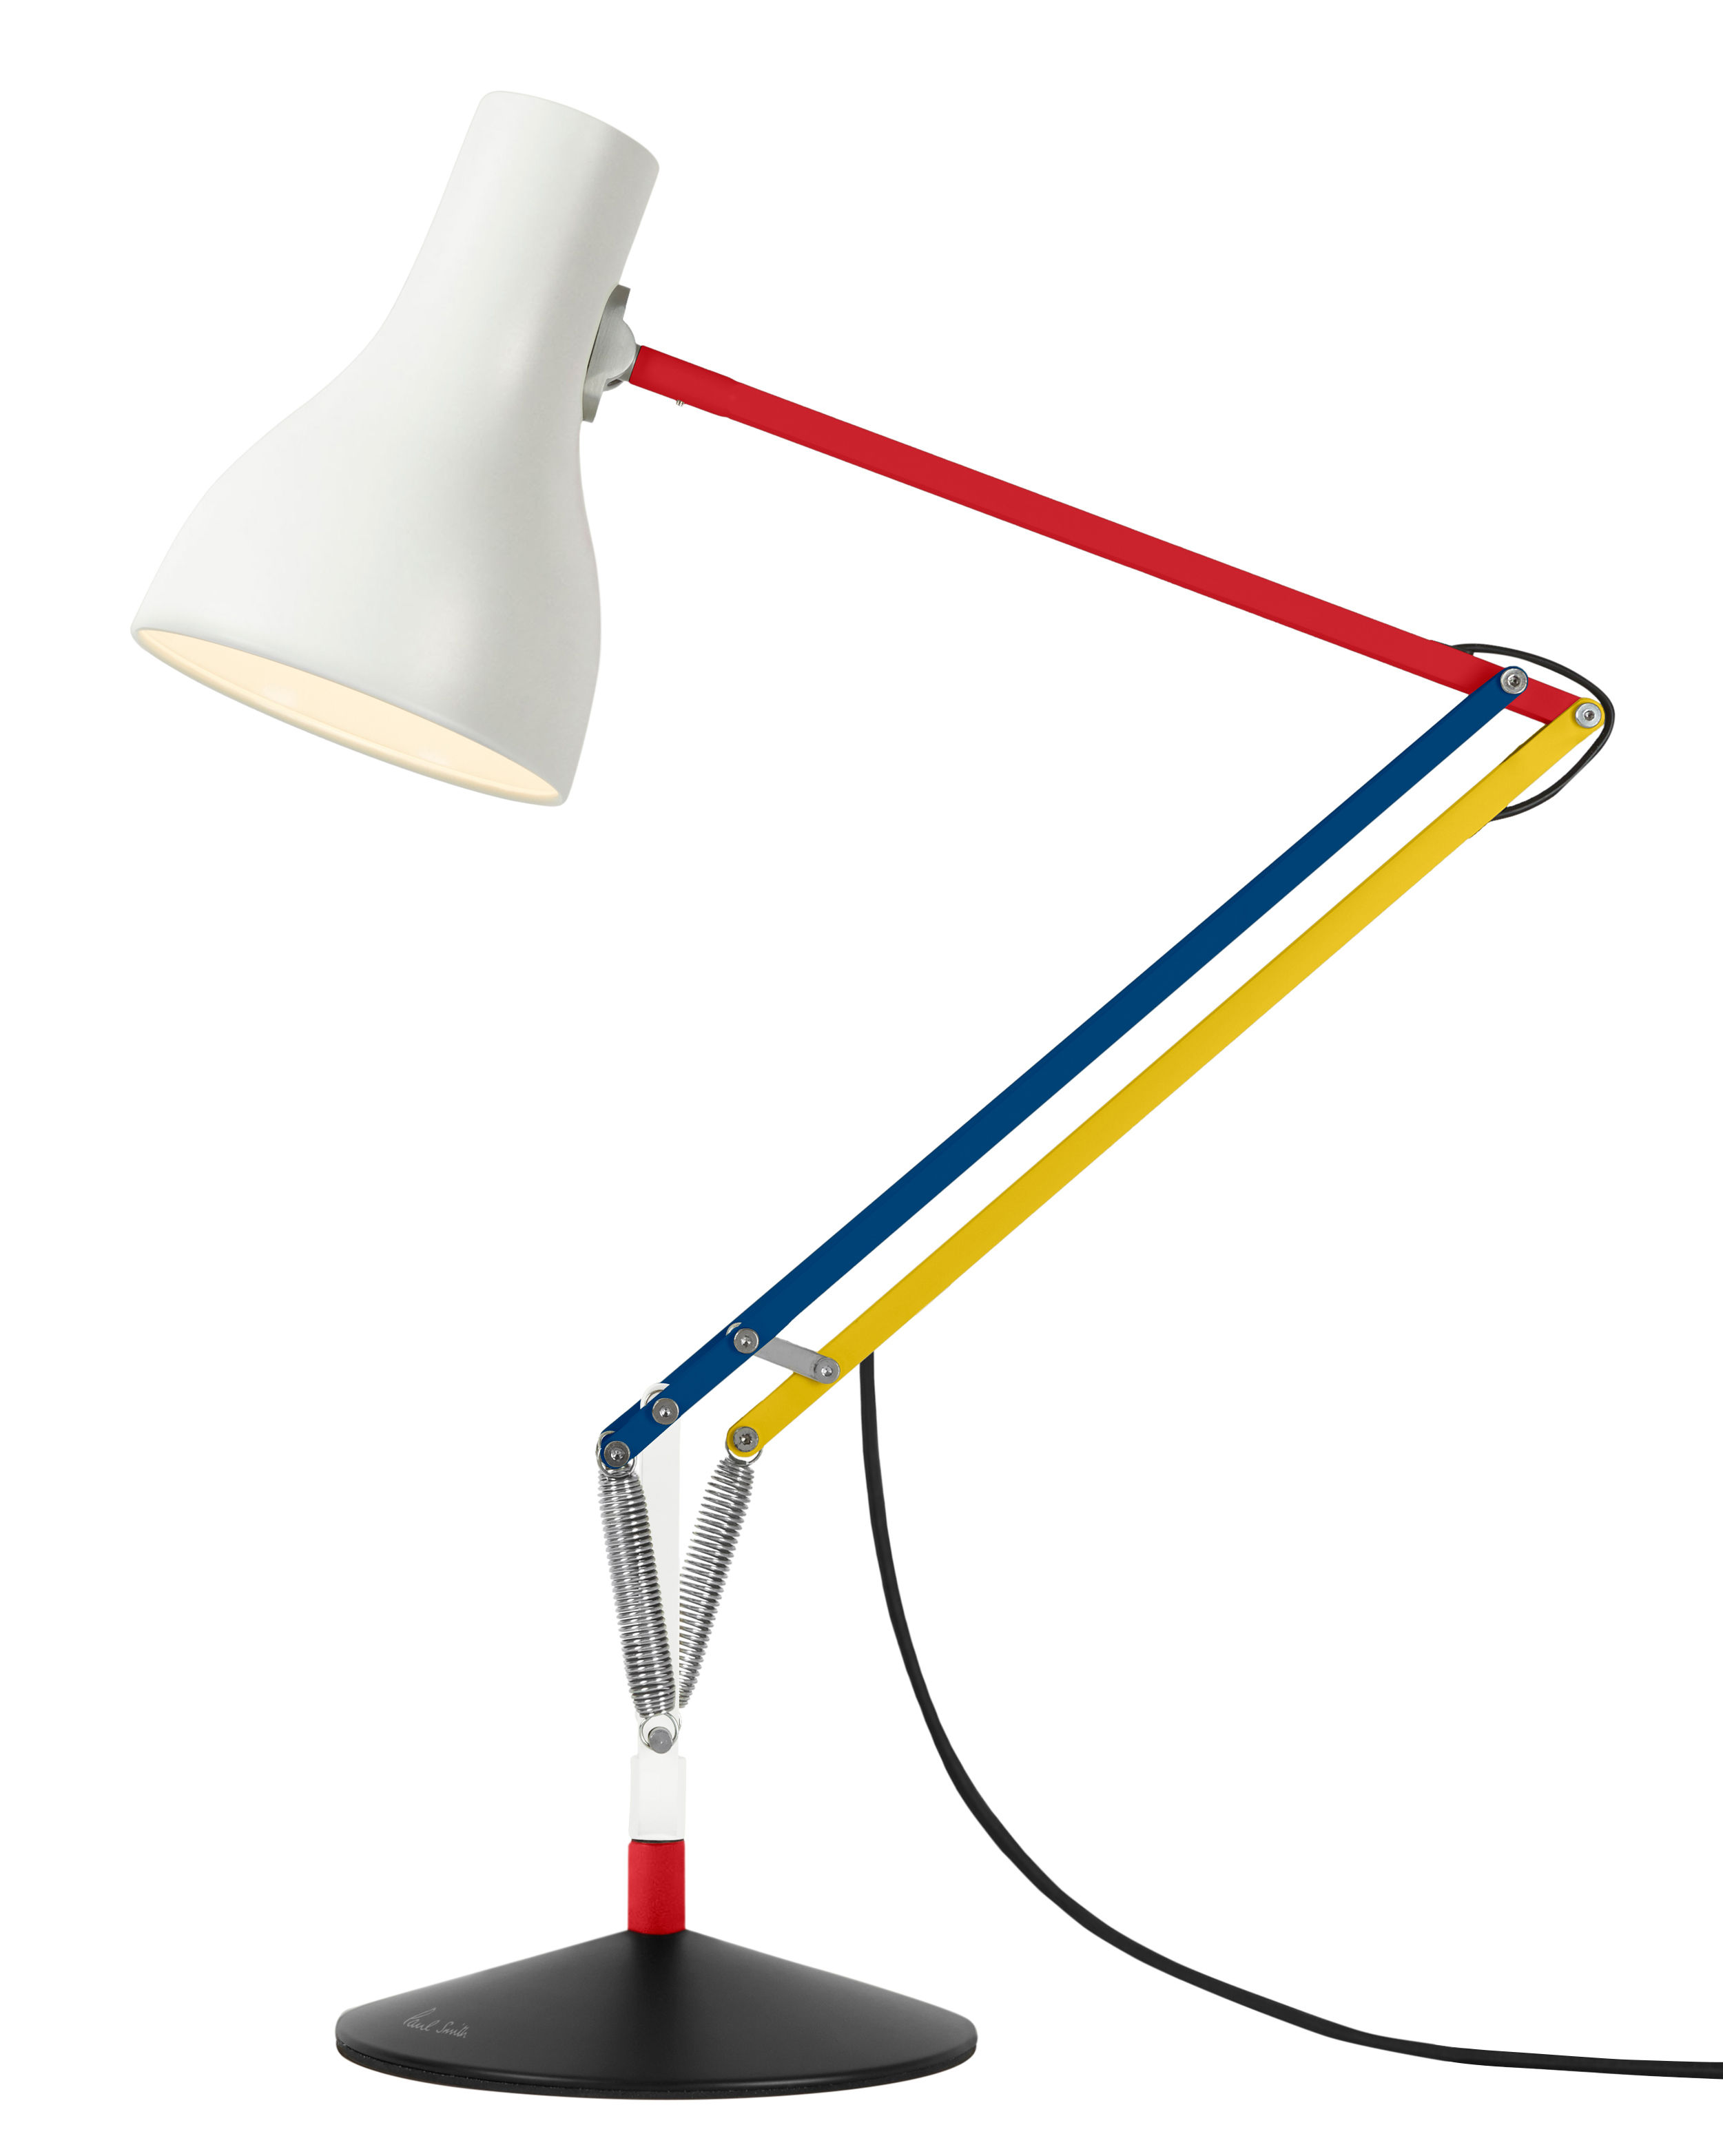 Luminaire - Lampes de table - Lampe de table Type 75 / By Paul Smith - Edition n°3 - Anglepoise - Rouge, Jaune, Bleu - Aluminium